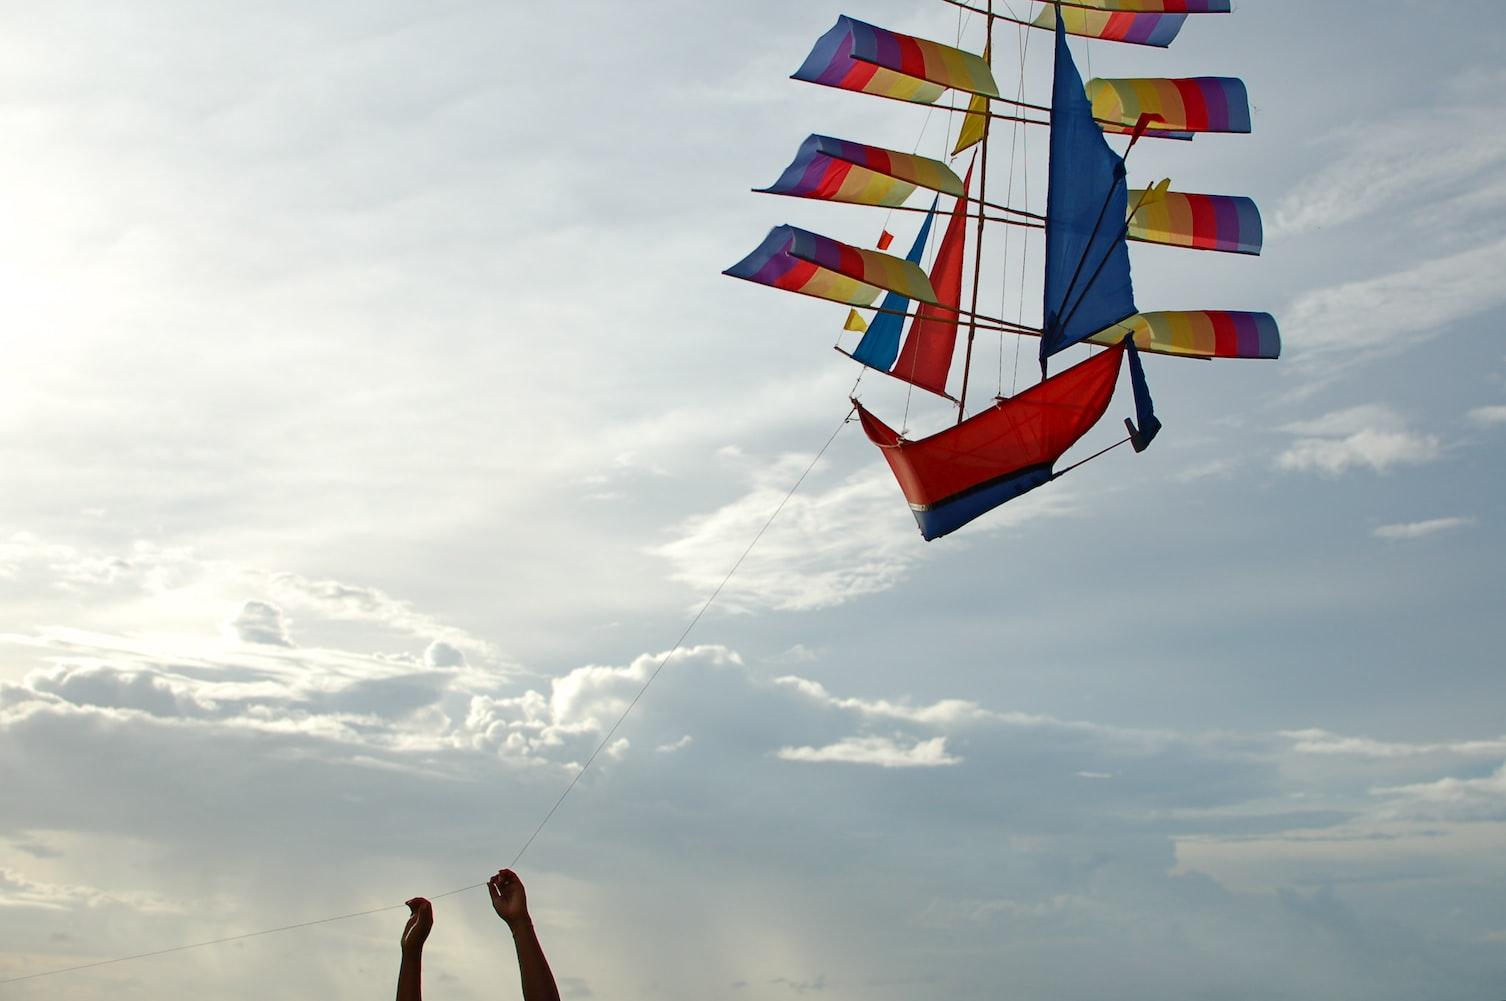 Bali Kites, Souvenirs to Buy from Bali